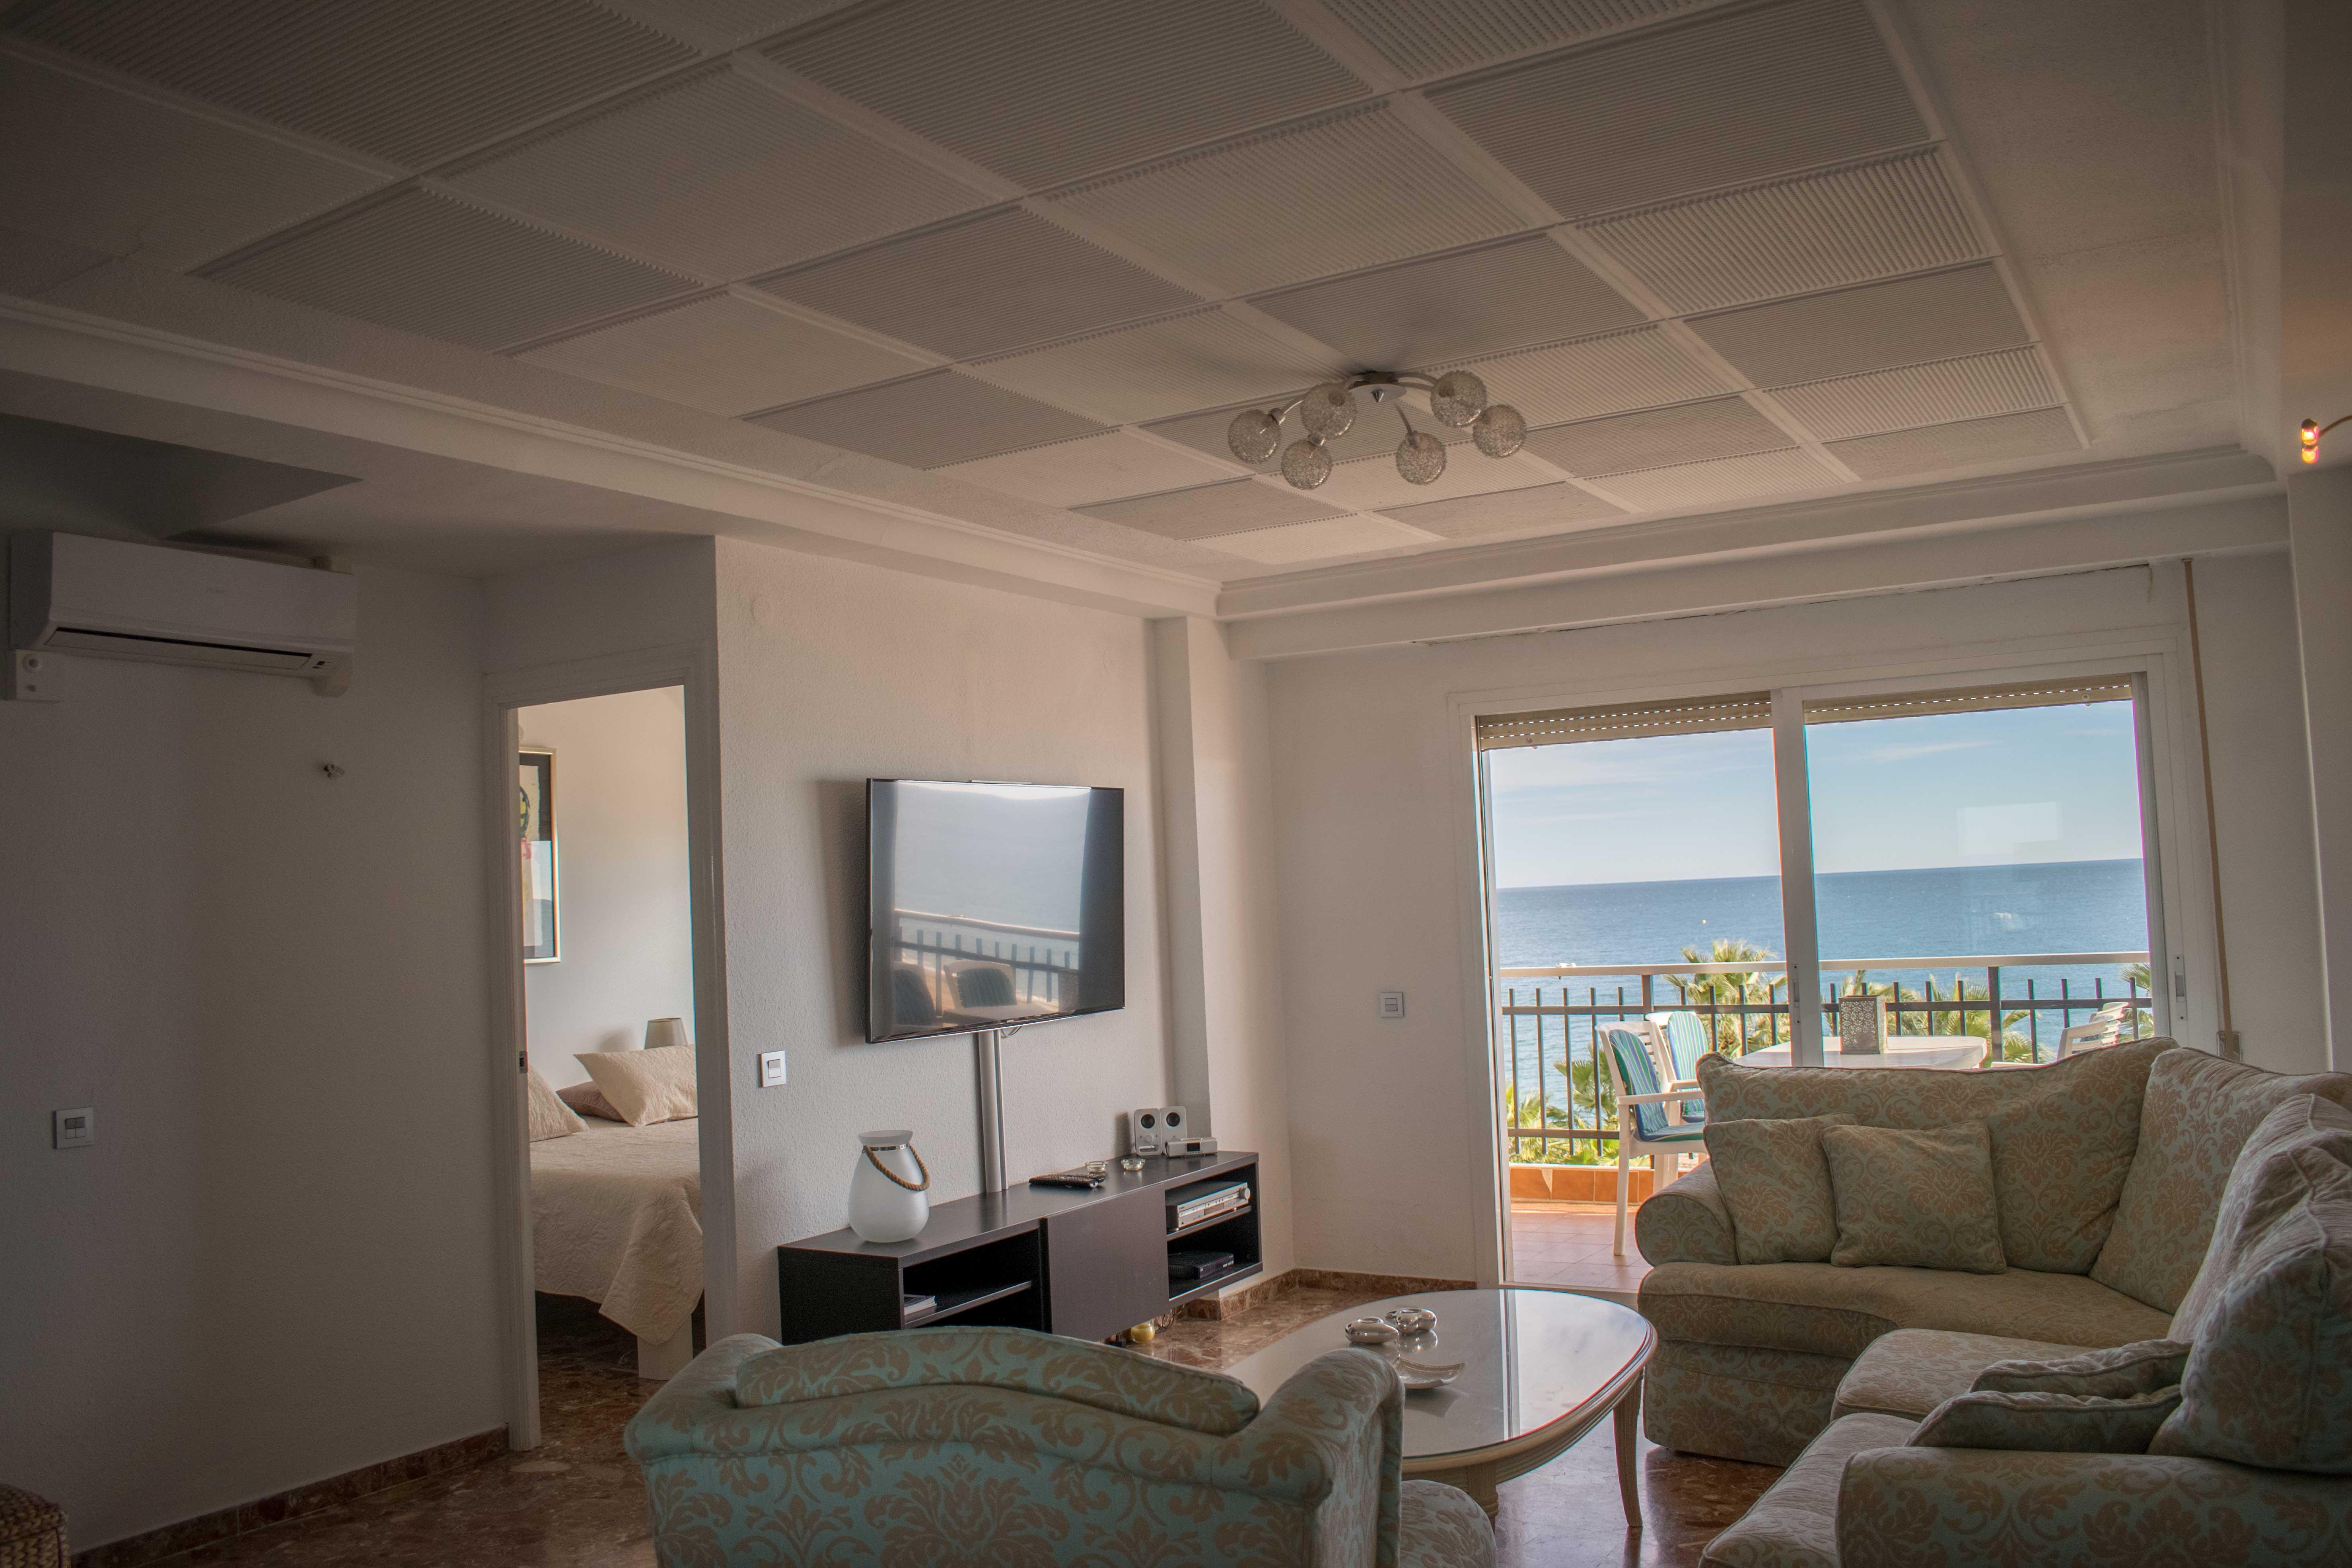 2 Slaapkamer appartement Fuengirola Niza - Floridabig